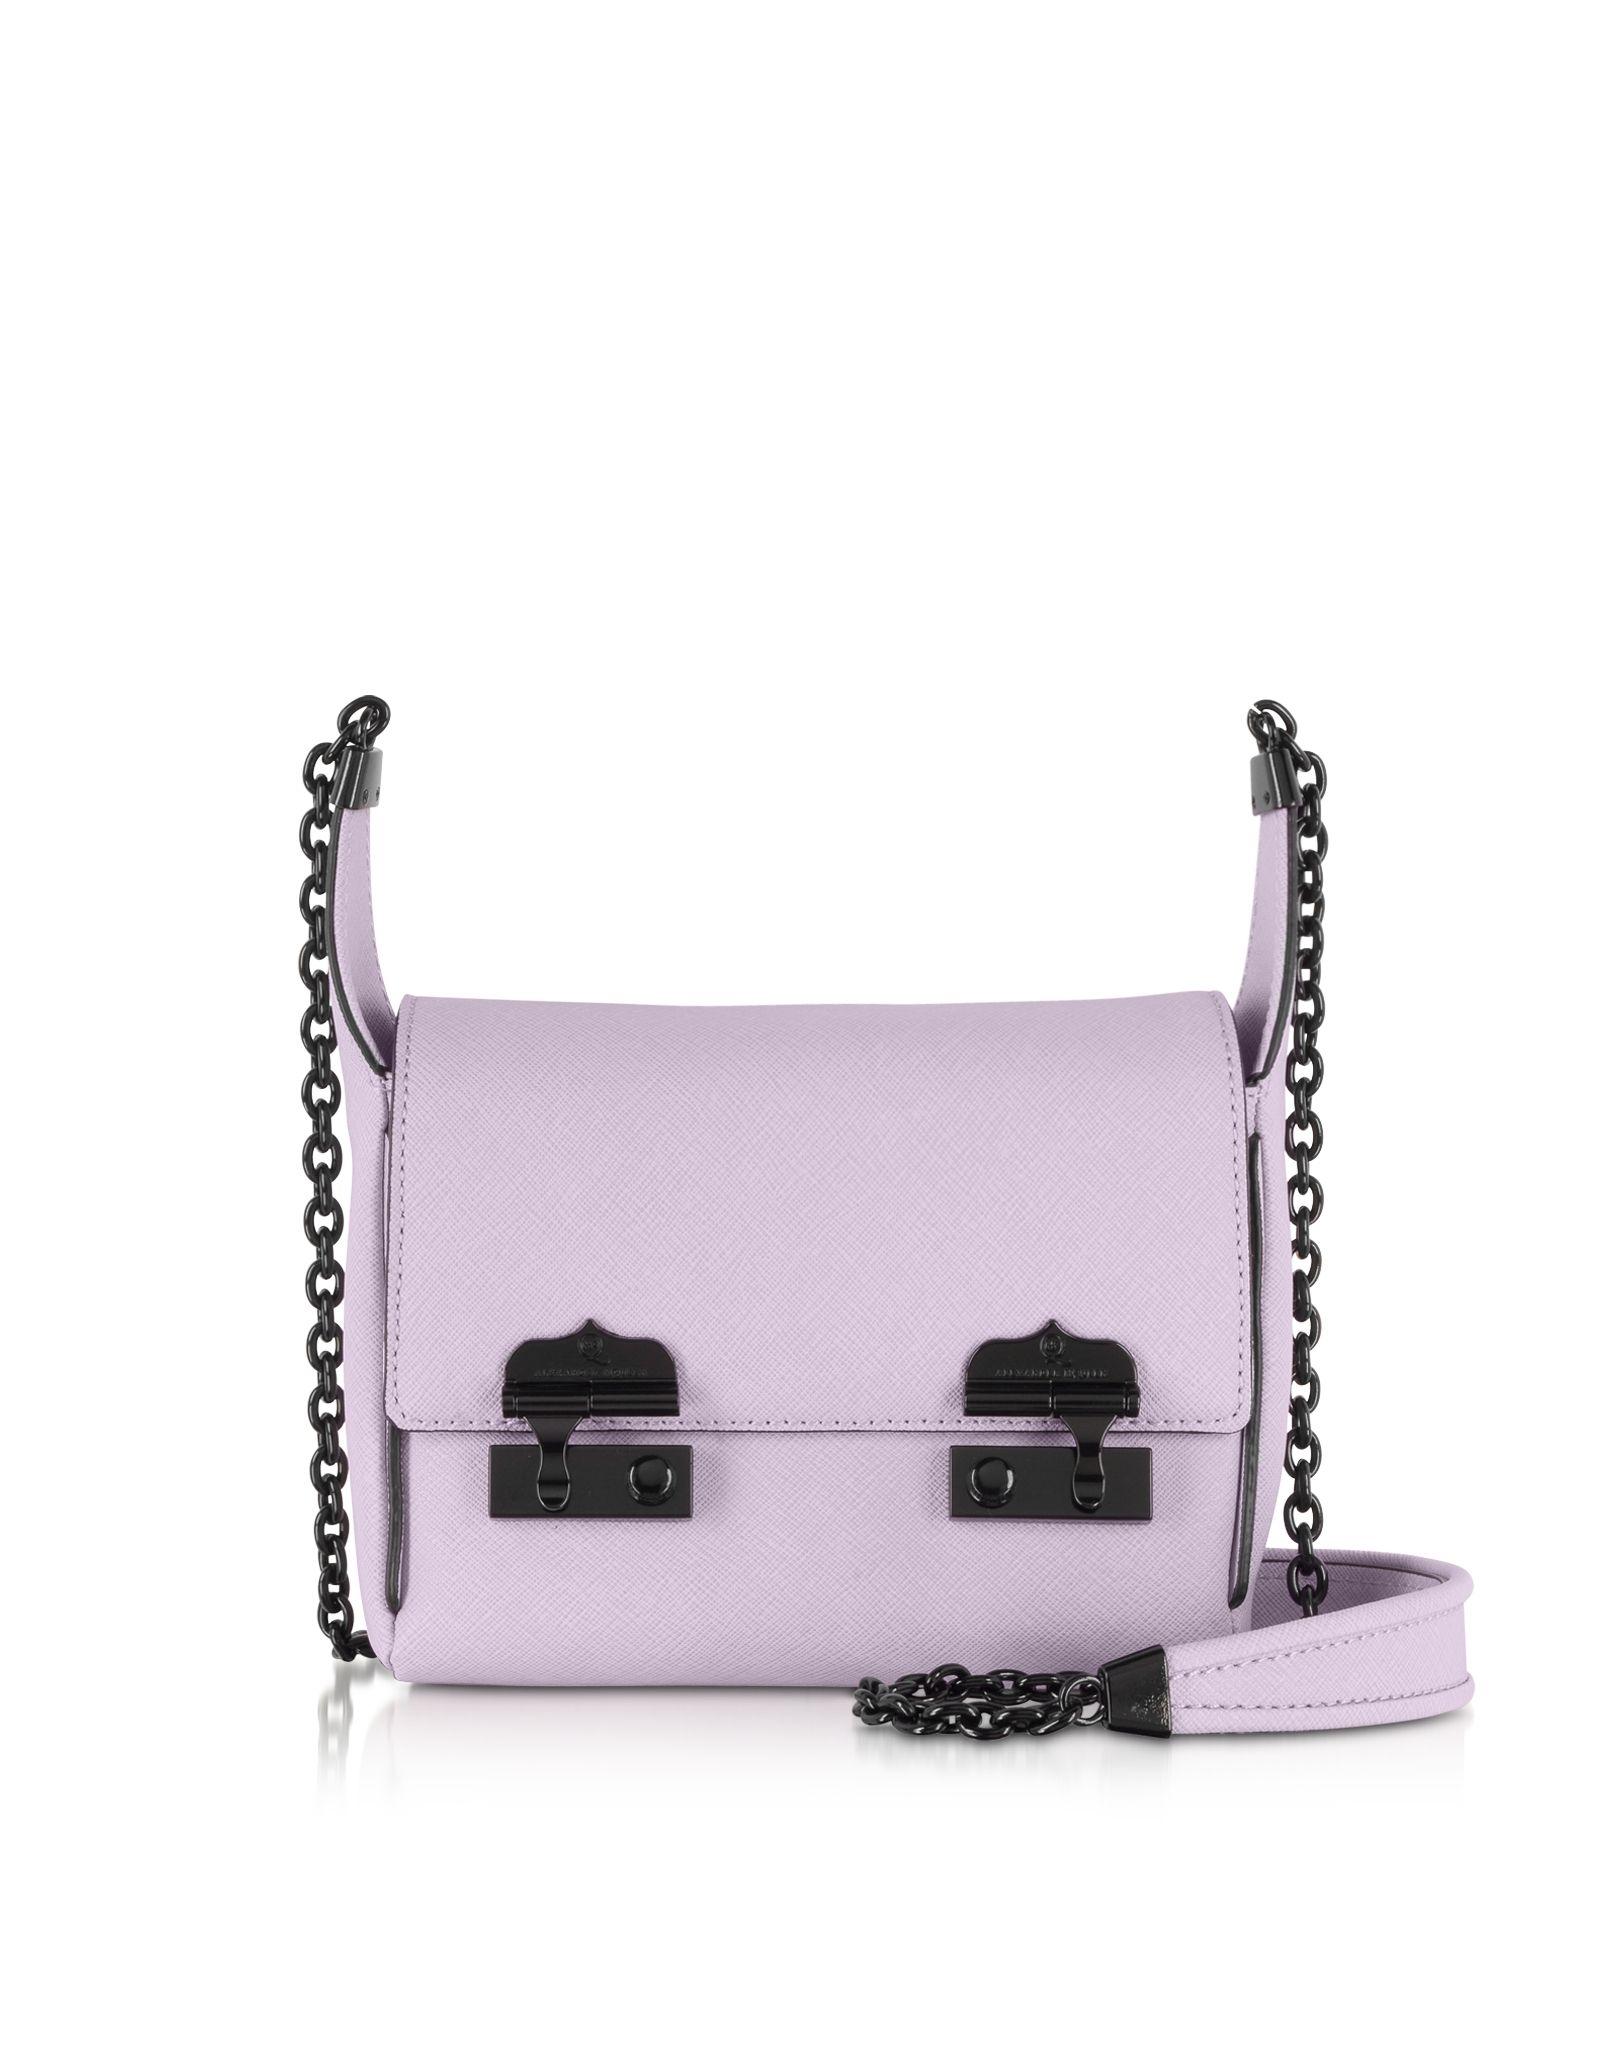 McQ by Alexander McQueen Baby Suzy Saffiano Leather Shoulder Bag in Lavender